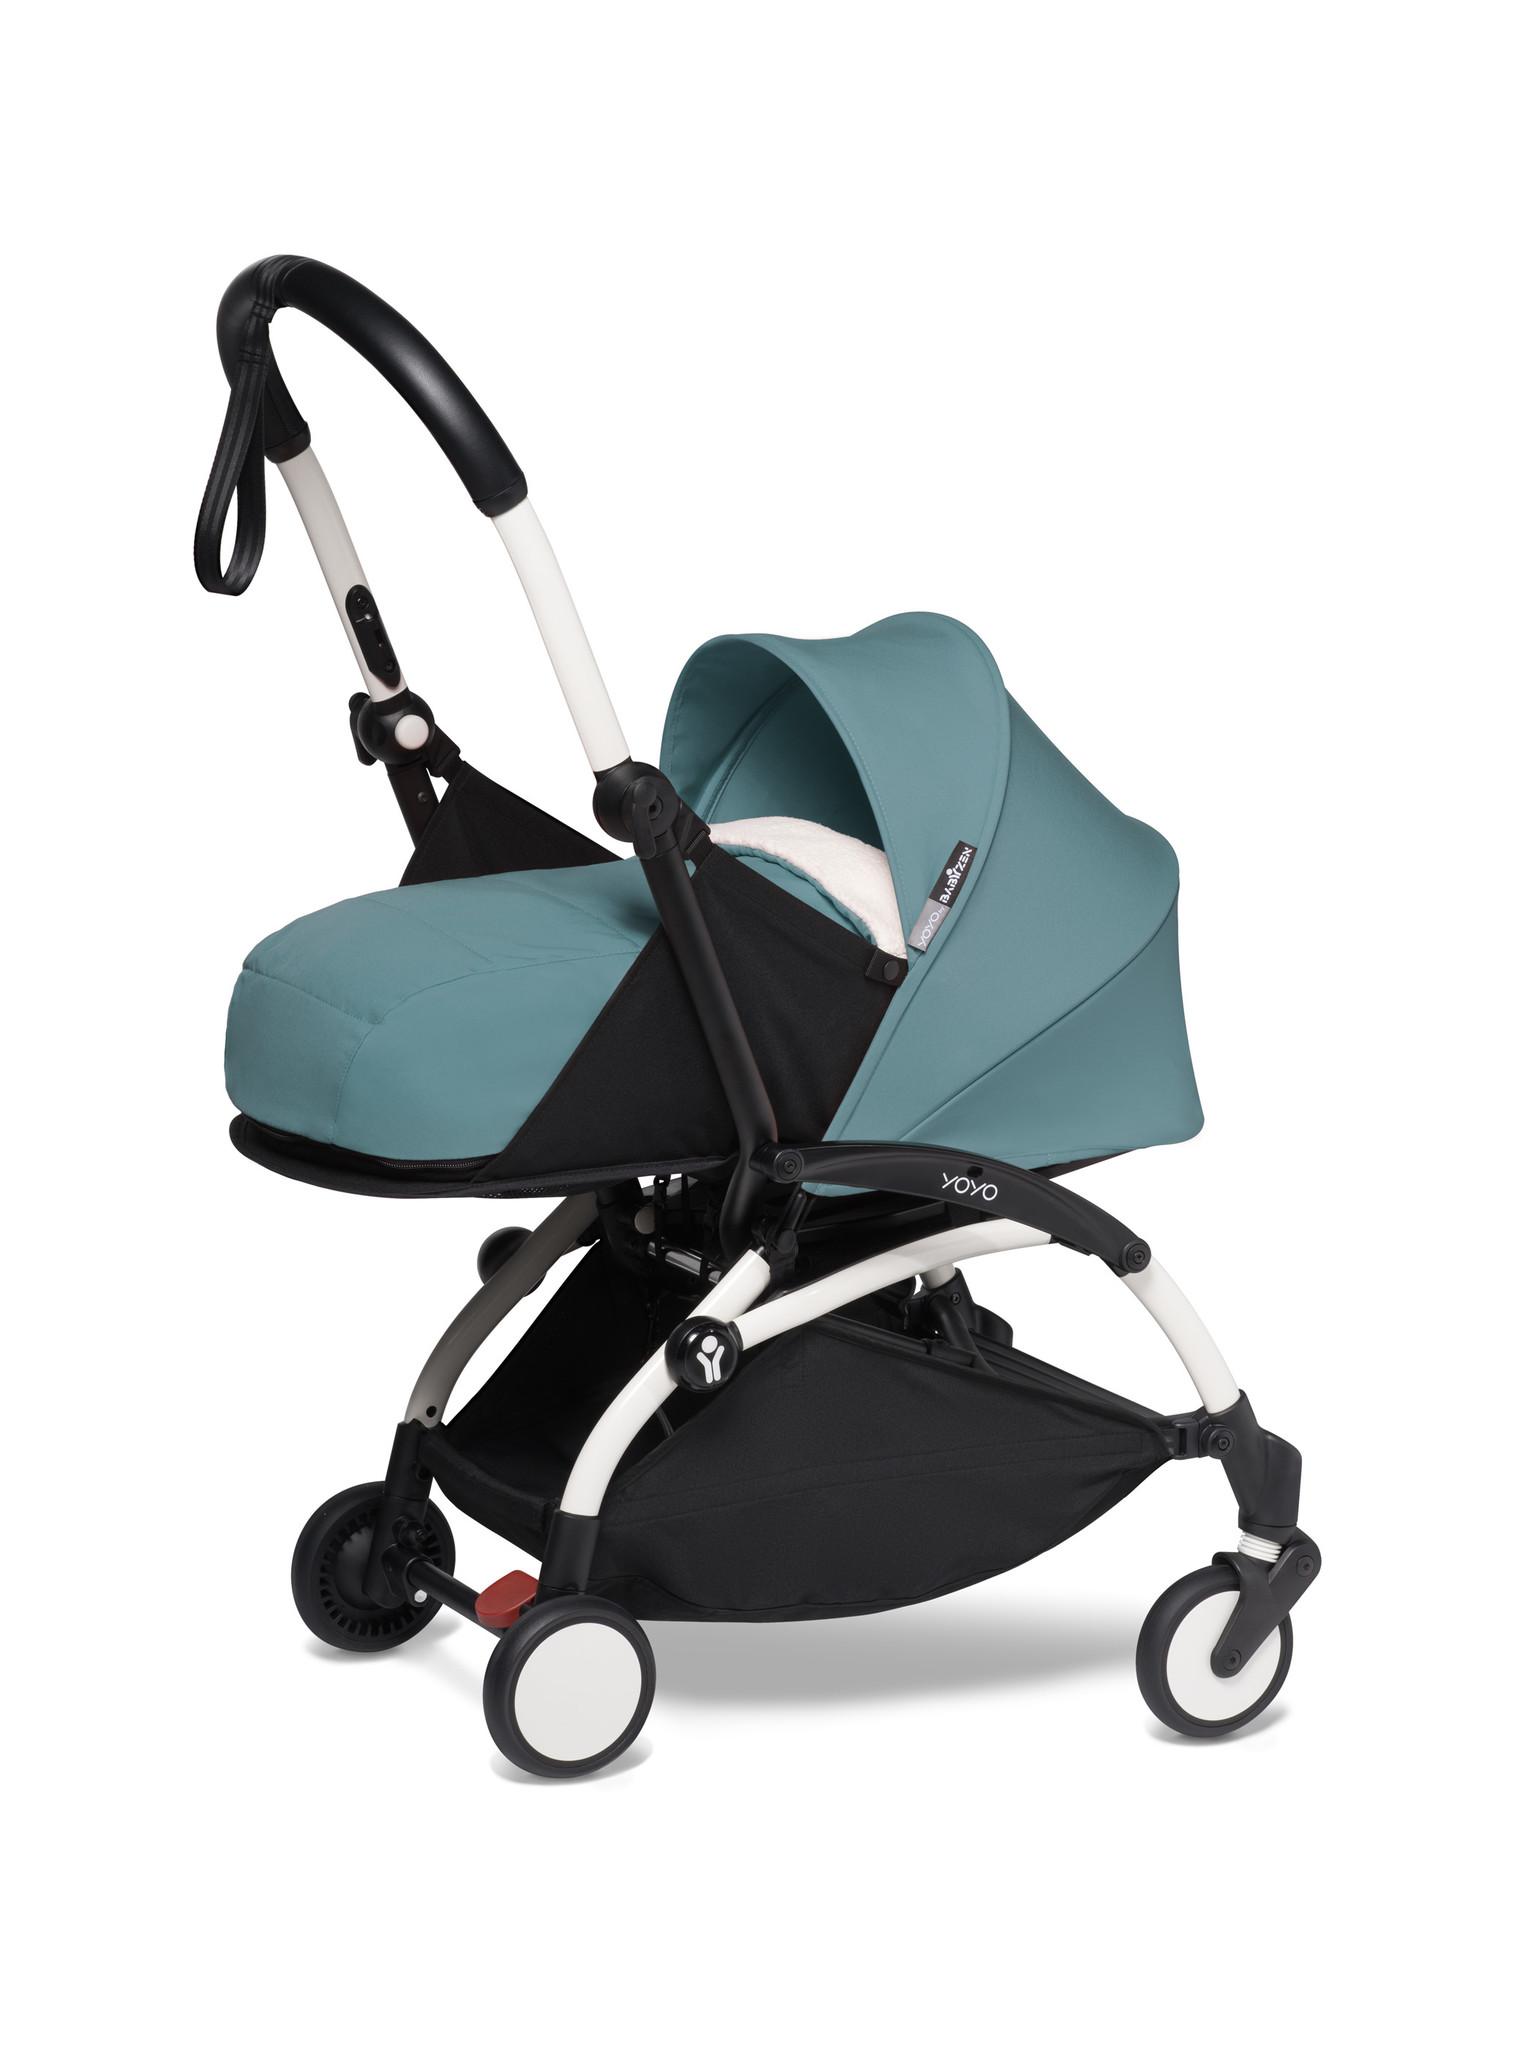 Babyzen Babyzen YOYO² Buggy KOMPLETT / VOLL SET 0+ und 6+ Aquarahmen weiß inkl. YOYO² BeSafe Autositz schwarz